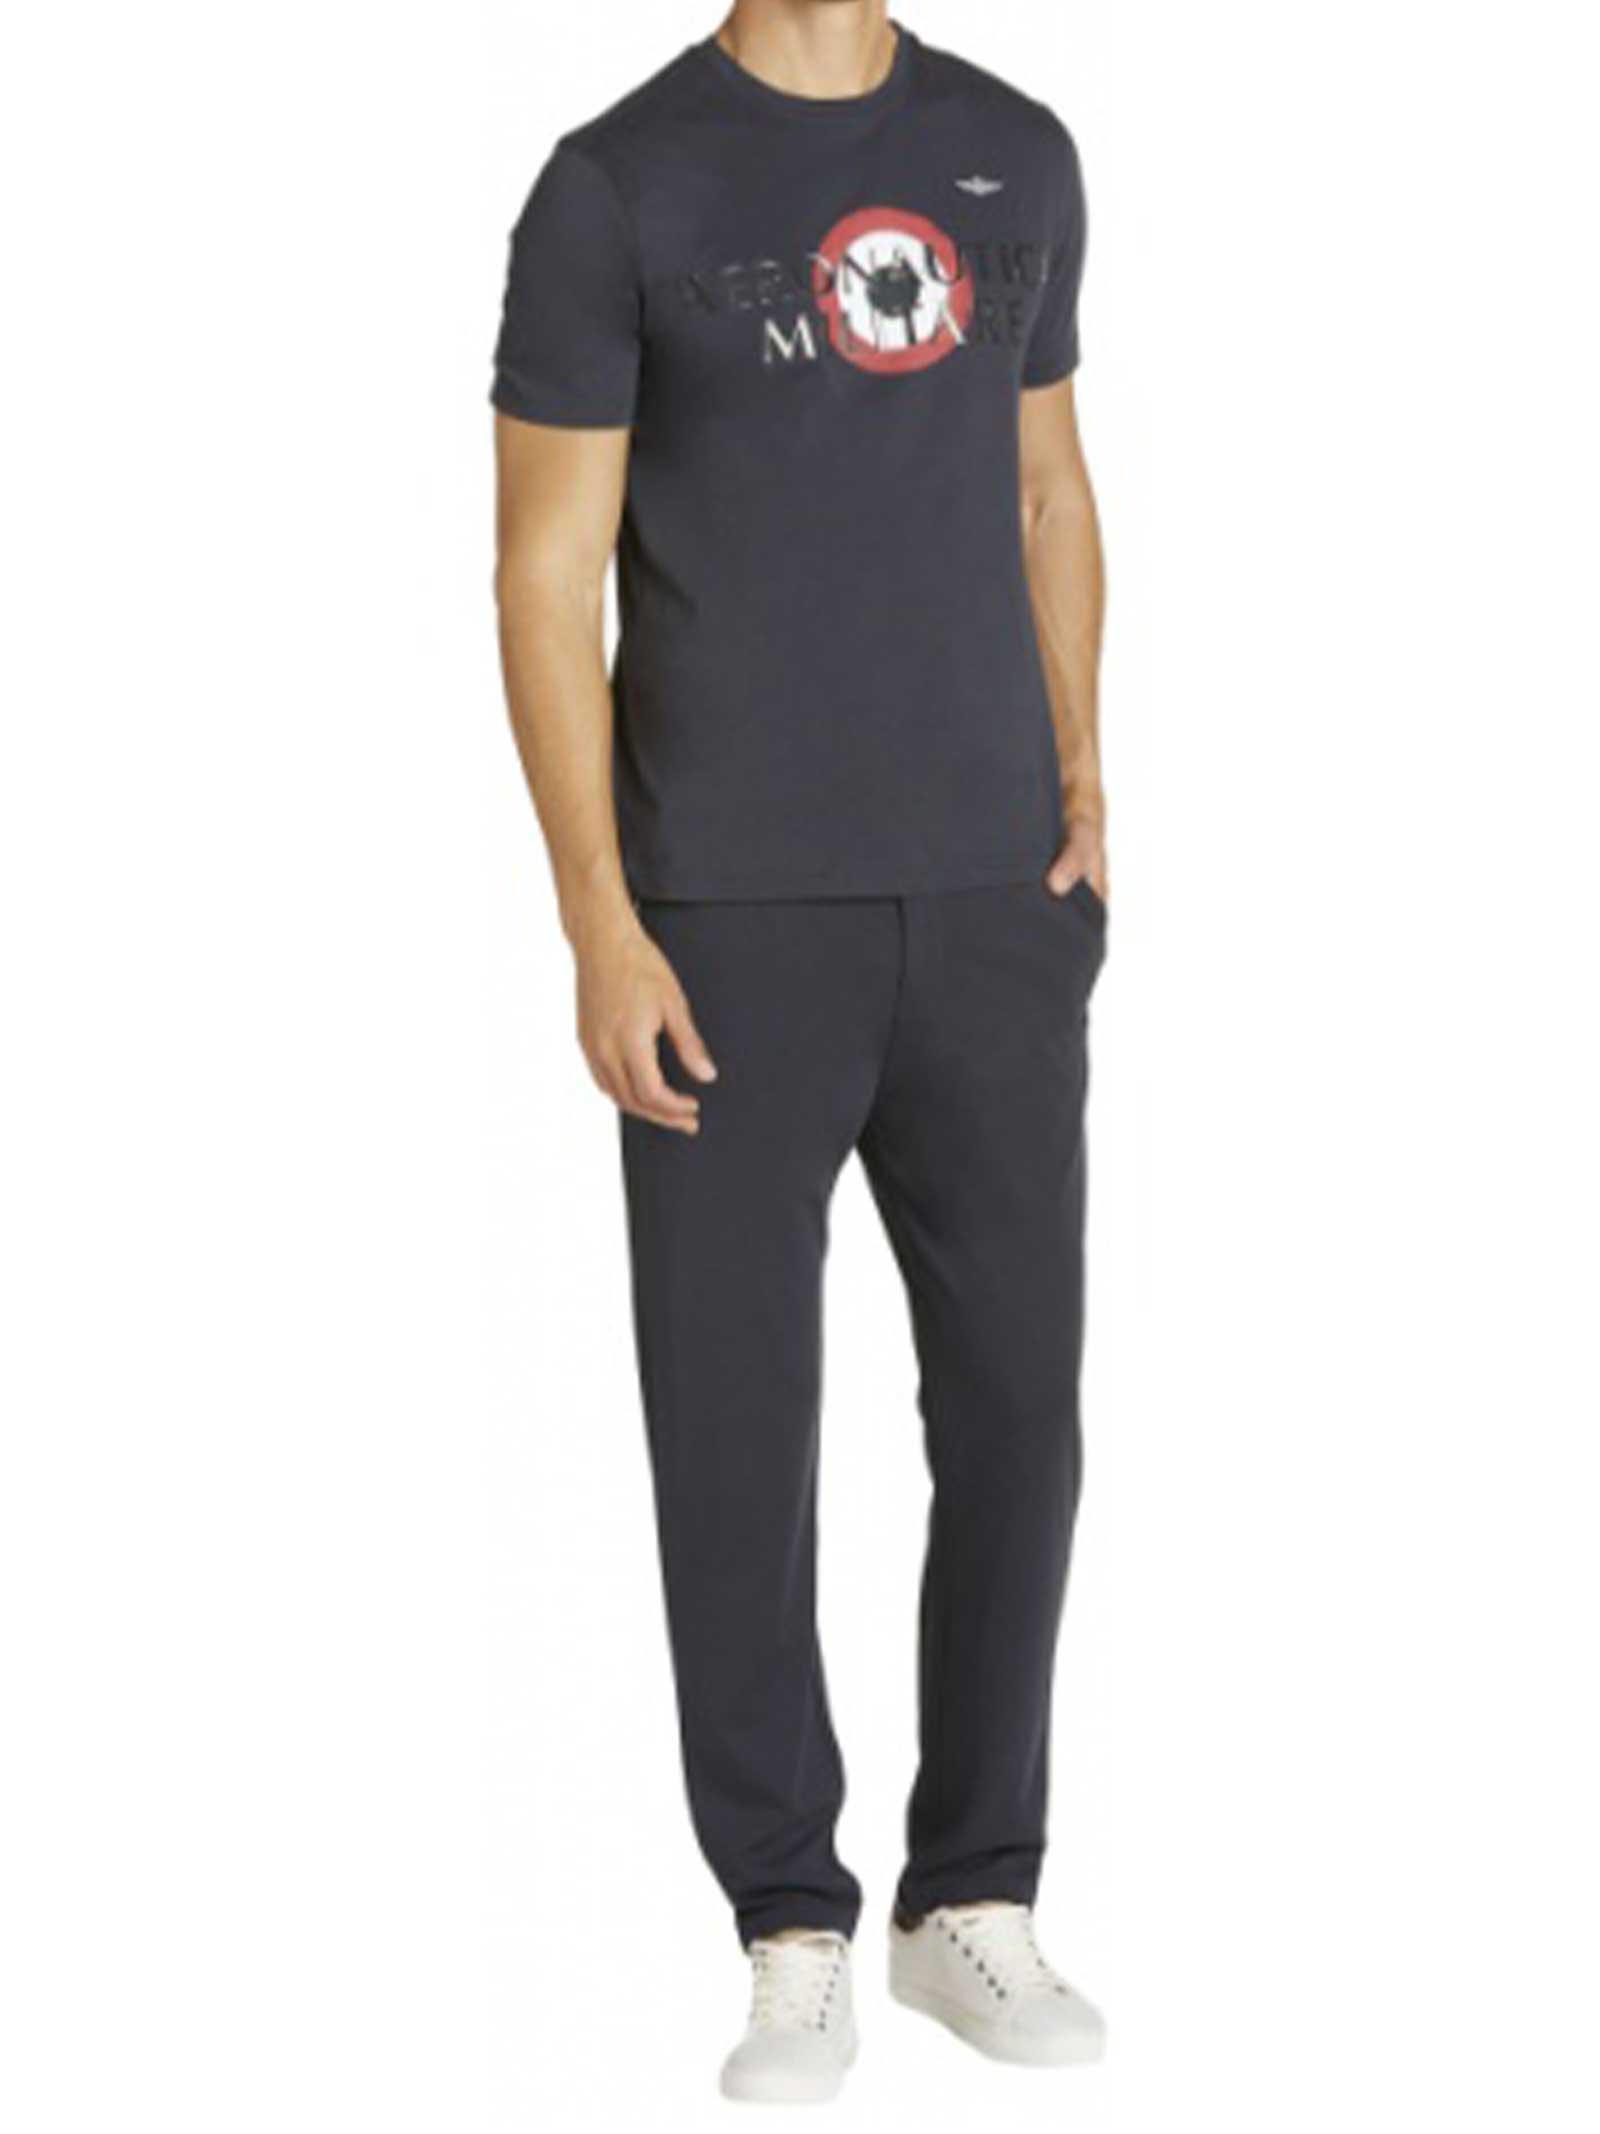 T-SHIRT UOMO AERONAUTICA MILITARE   T-shirt   201TS1710J45208184